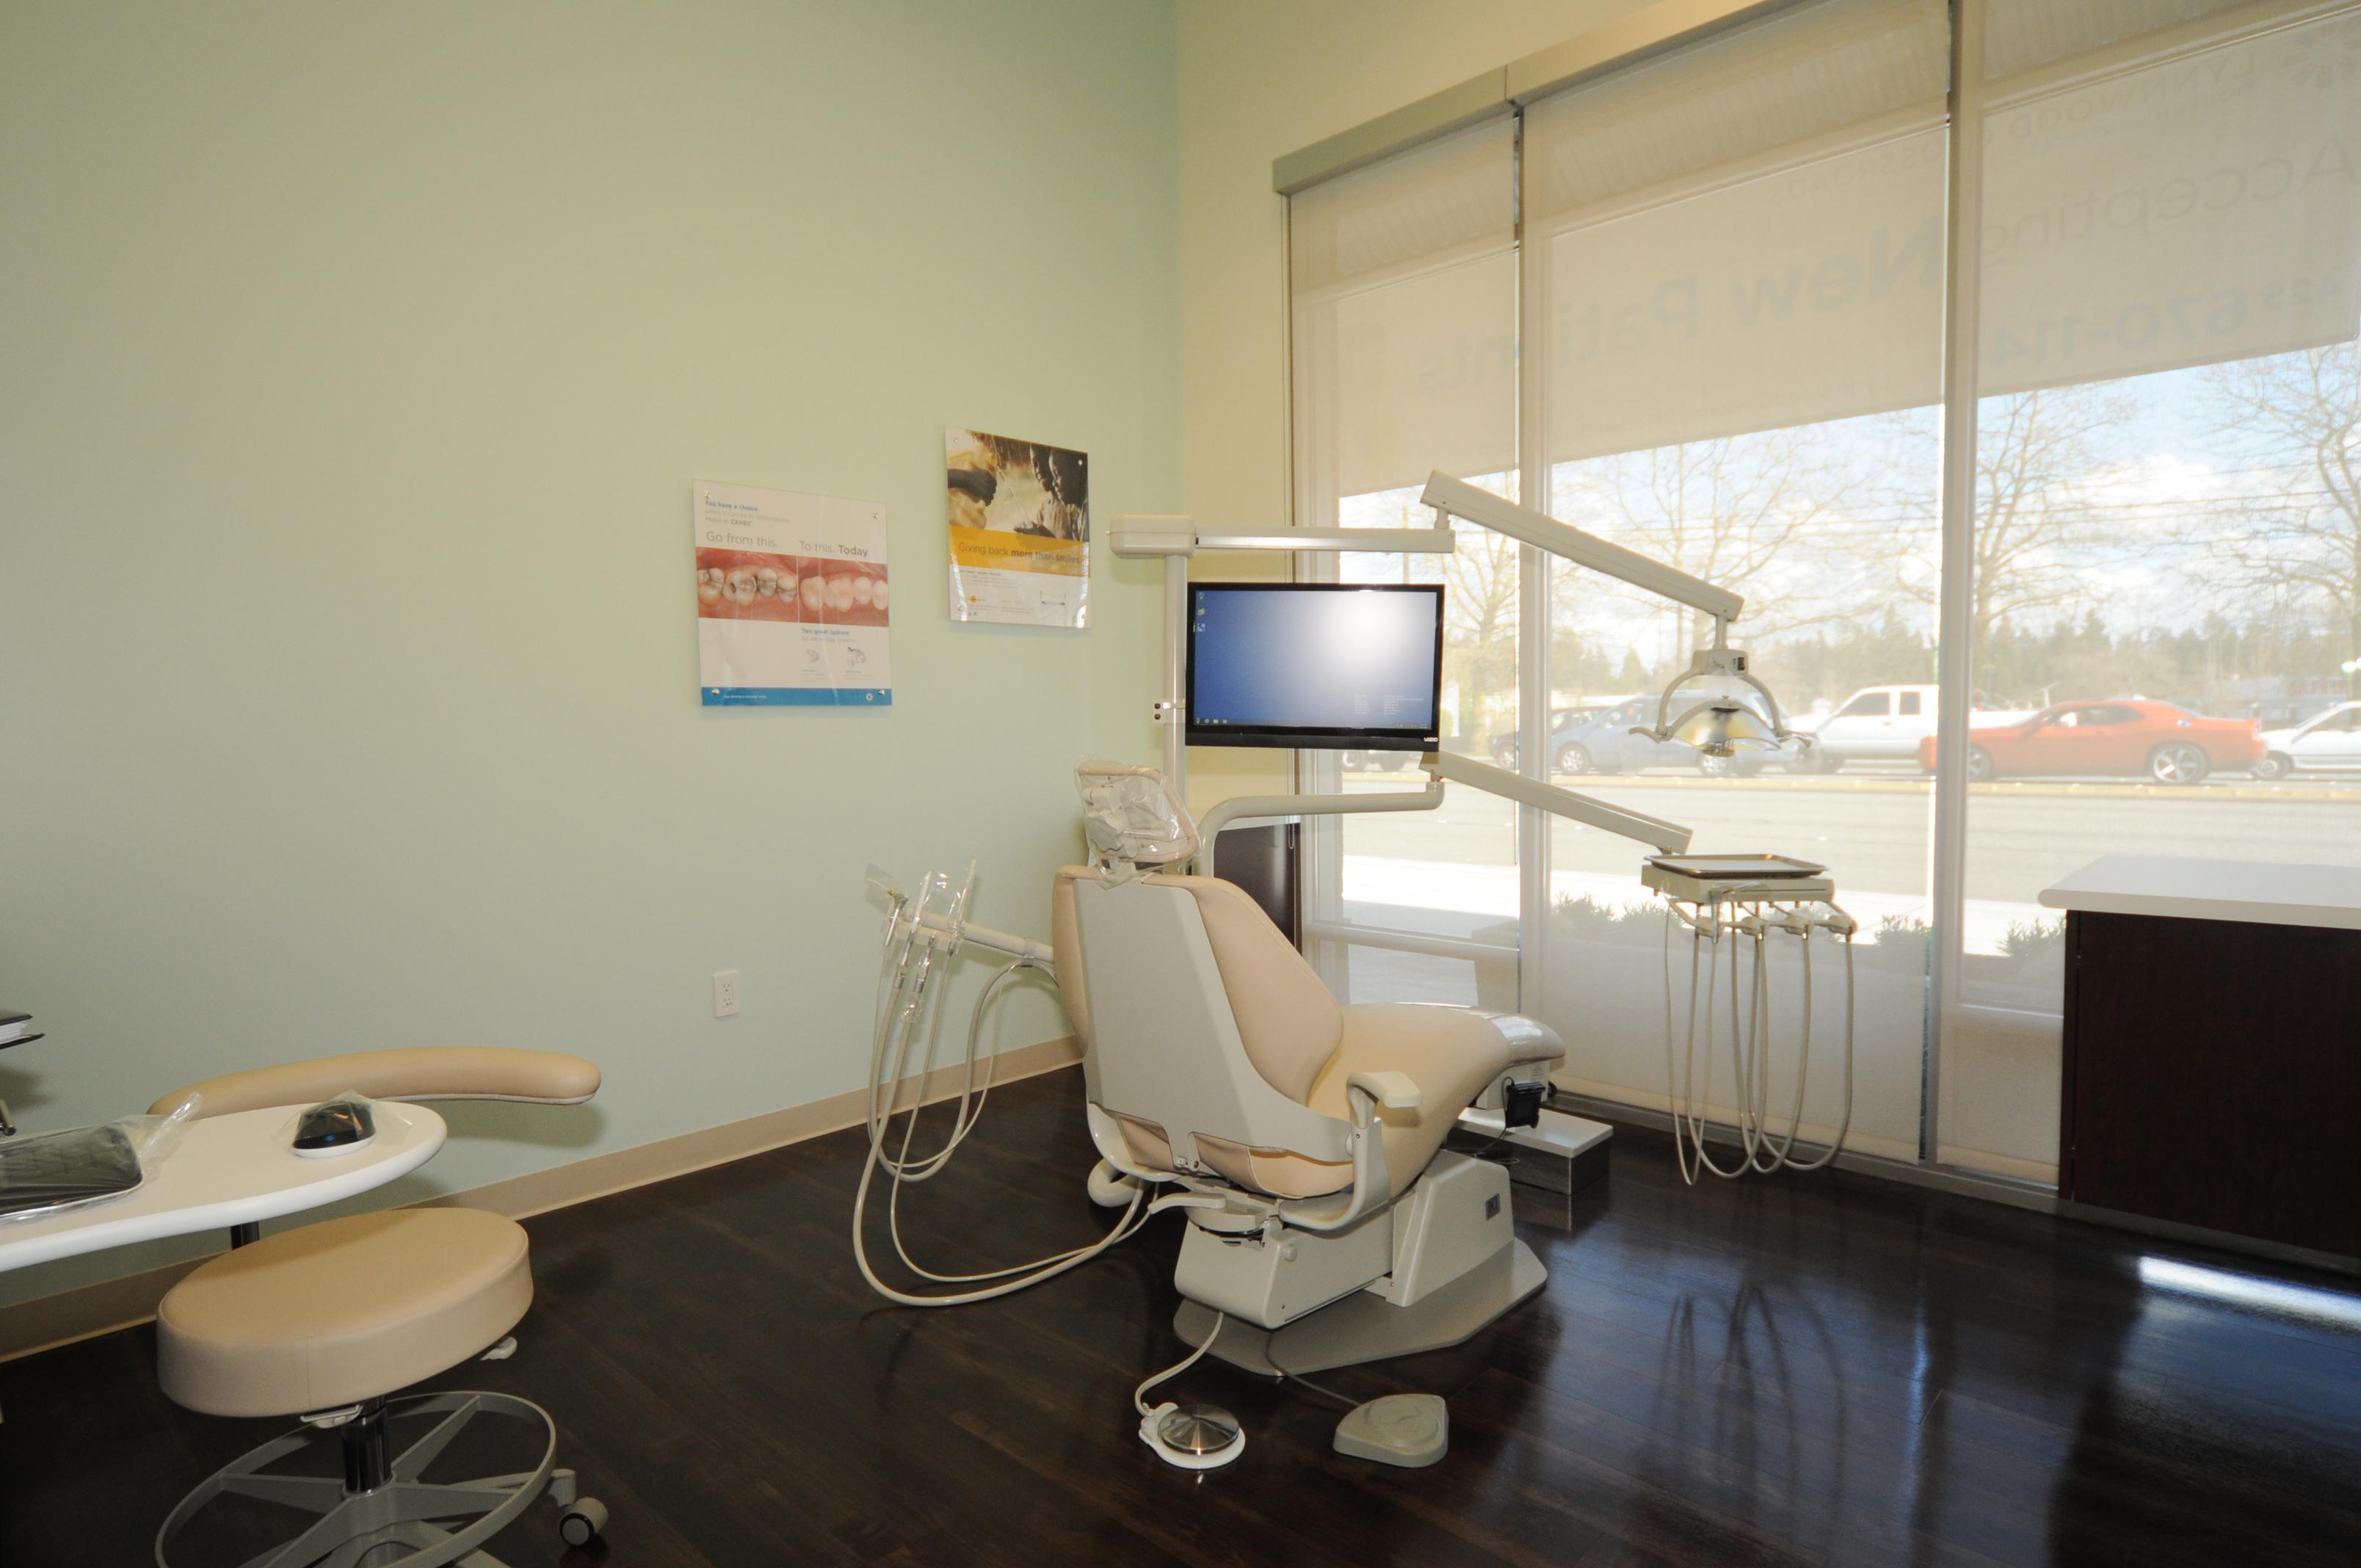 Lynnwood Crossroads Modern Dentistry and Orthodontics image 11